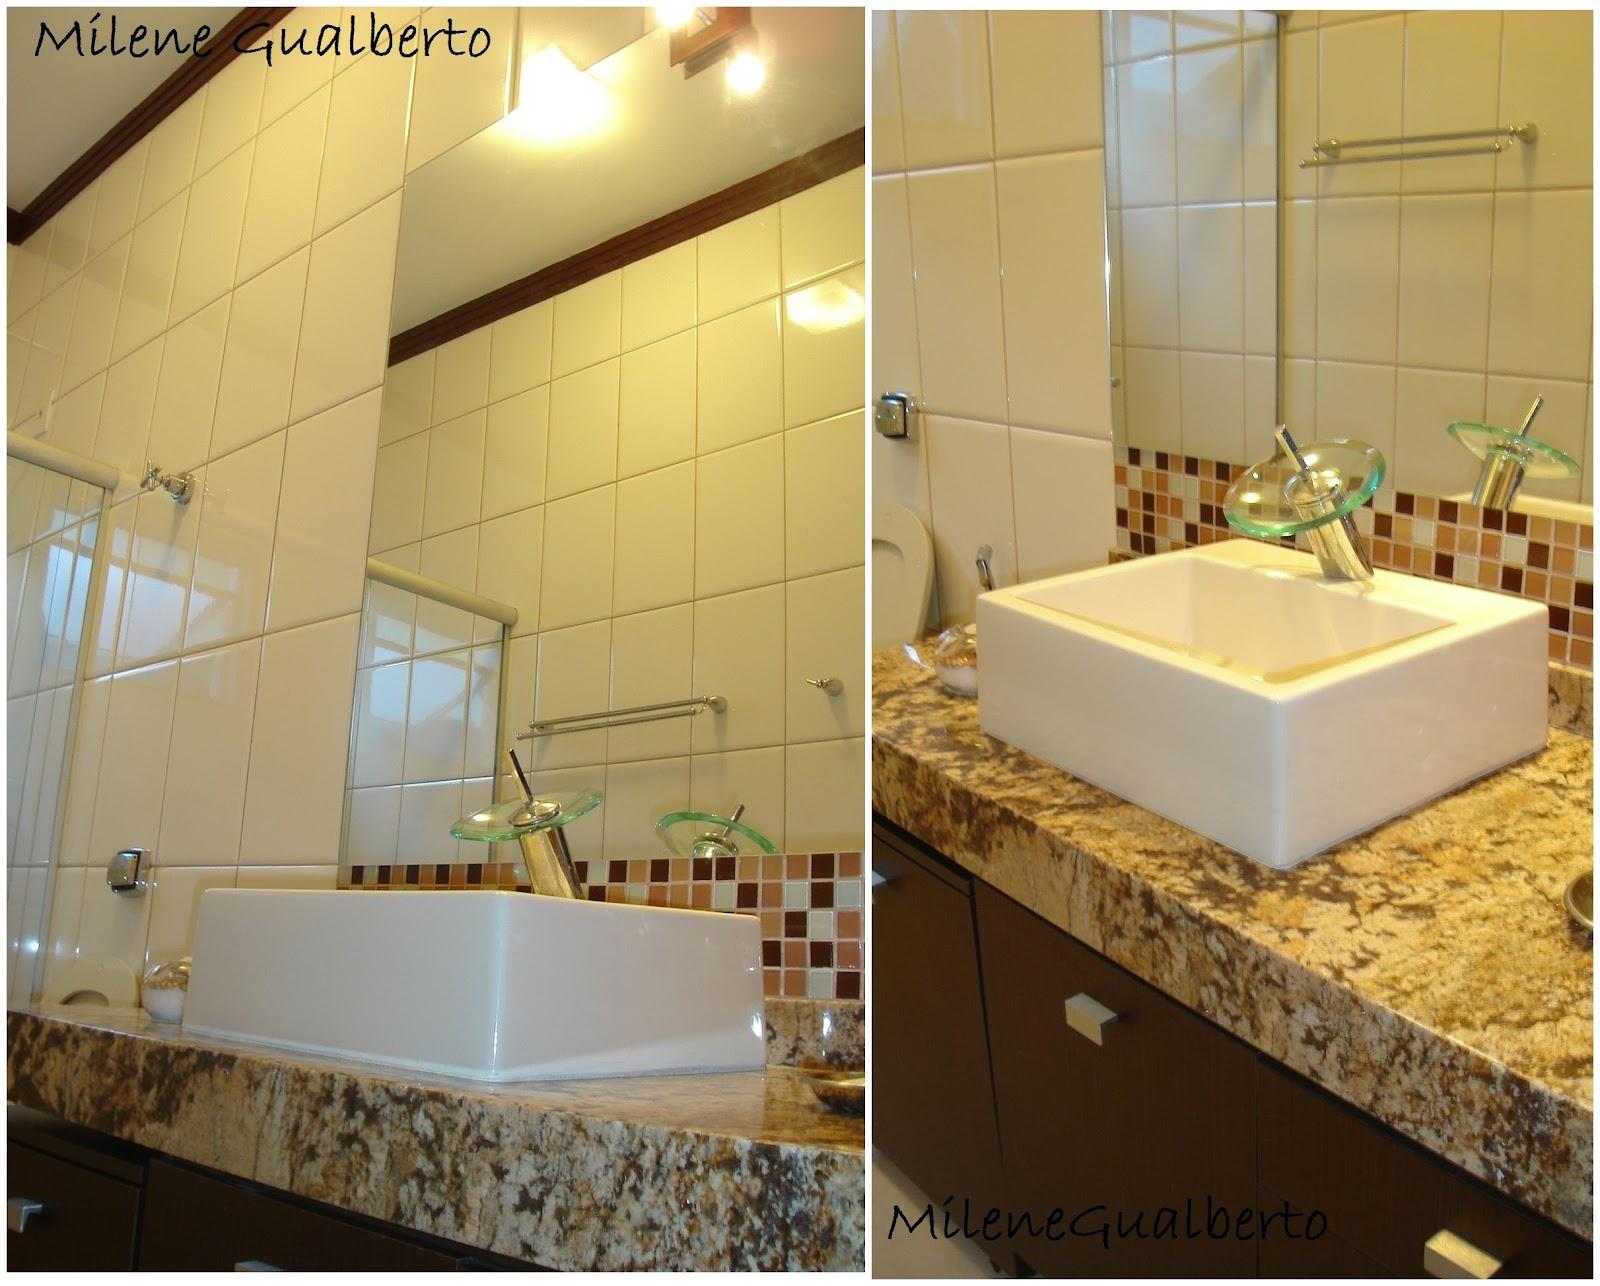 Gabinete Para Banheiro: Projeto banheiro pequeno simples #AA8021 1600 1286